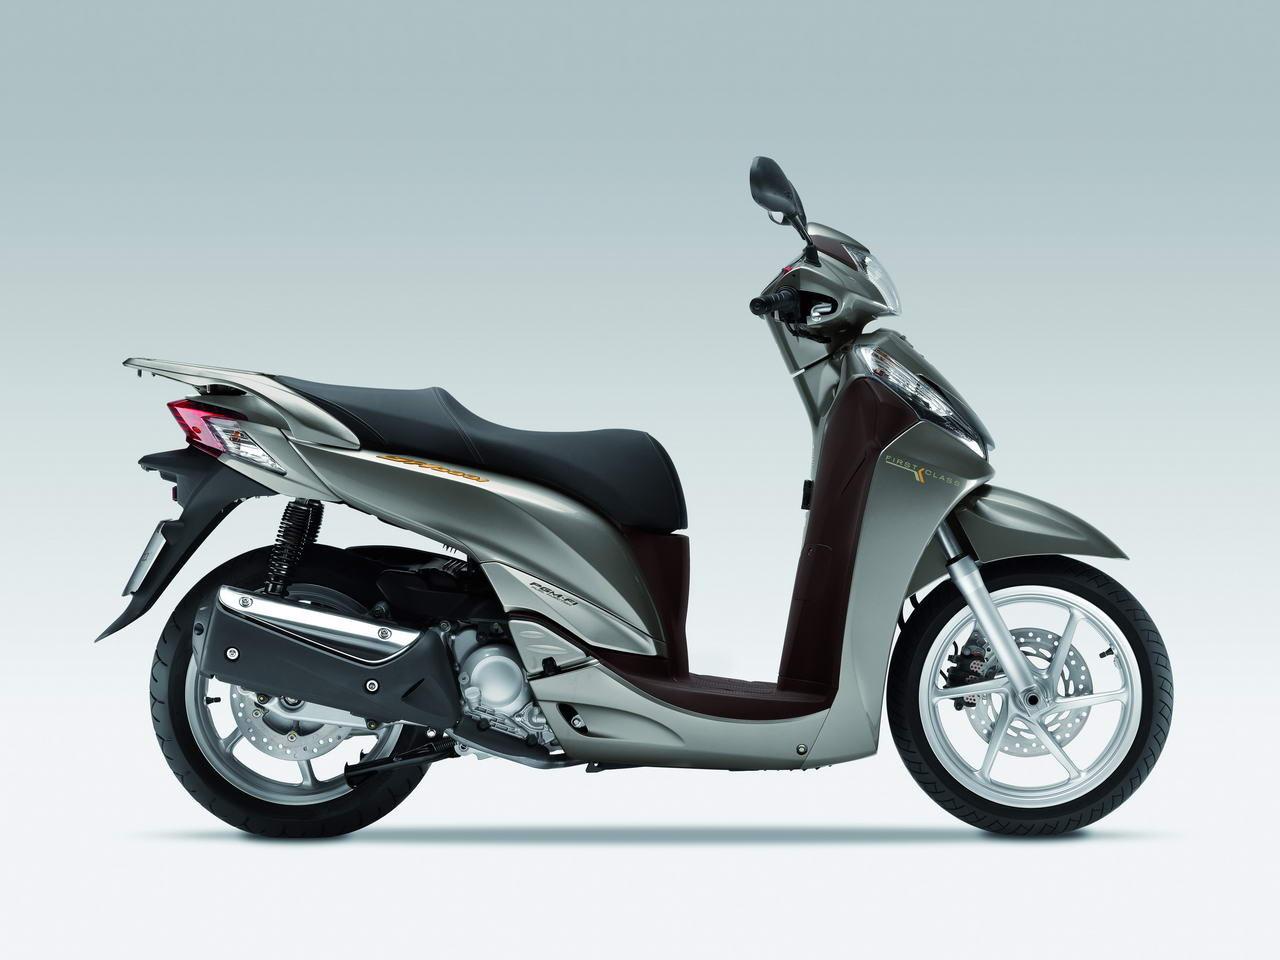 Listino Honda CB500R ABS Sport - image 14714_honda-sh300ispecial-abs on https://moto.motori.net